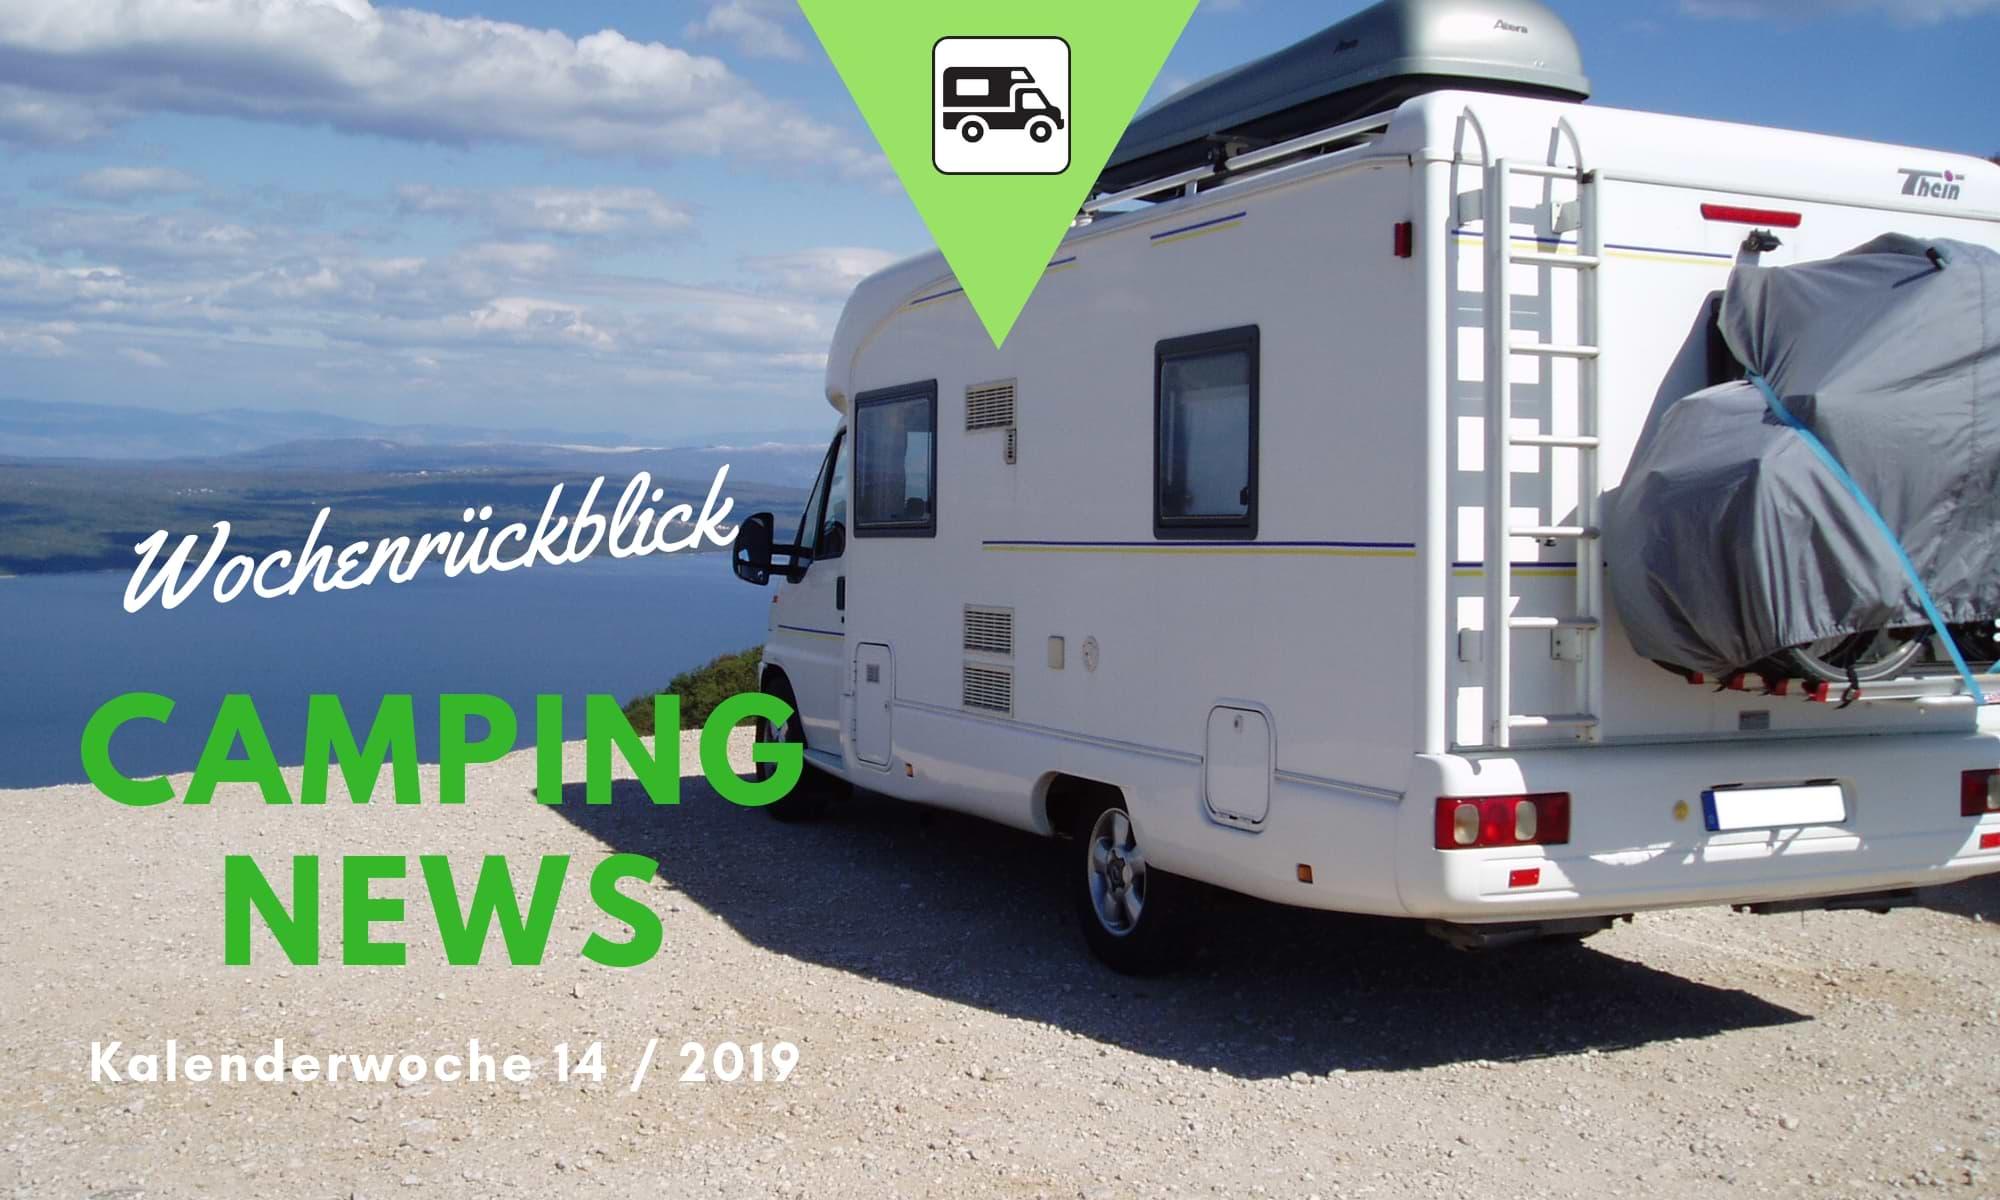 Wochenrückblick Camping News KW14-2019